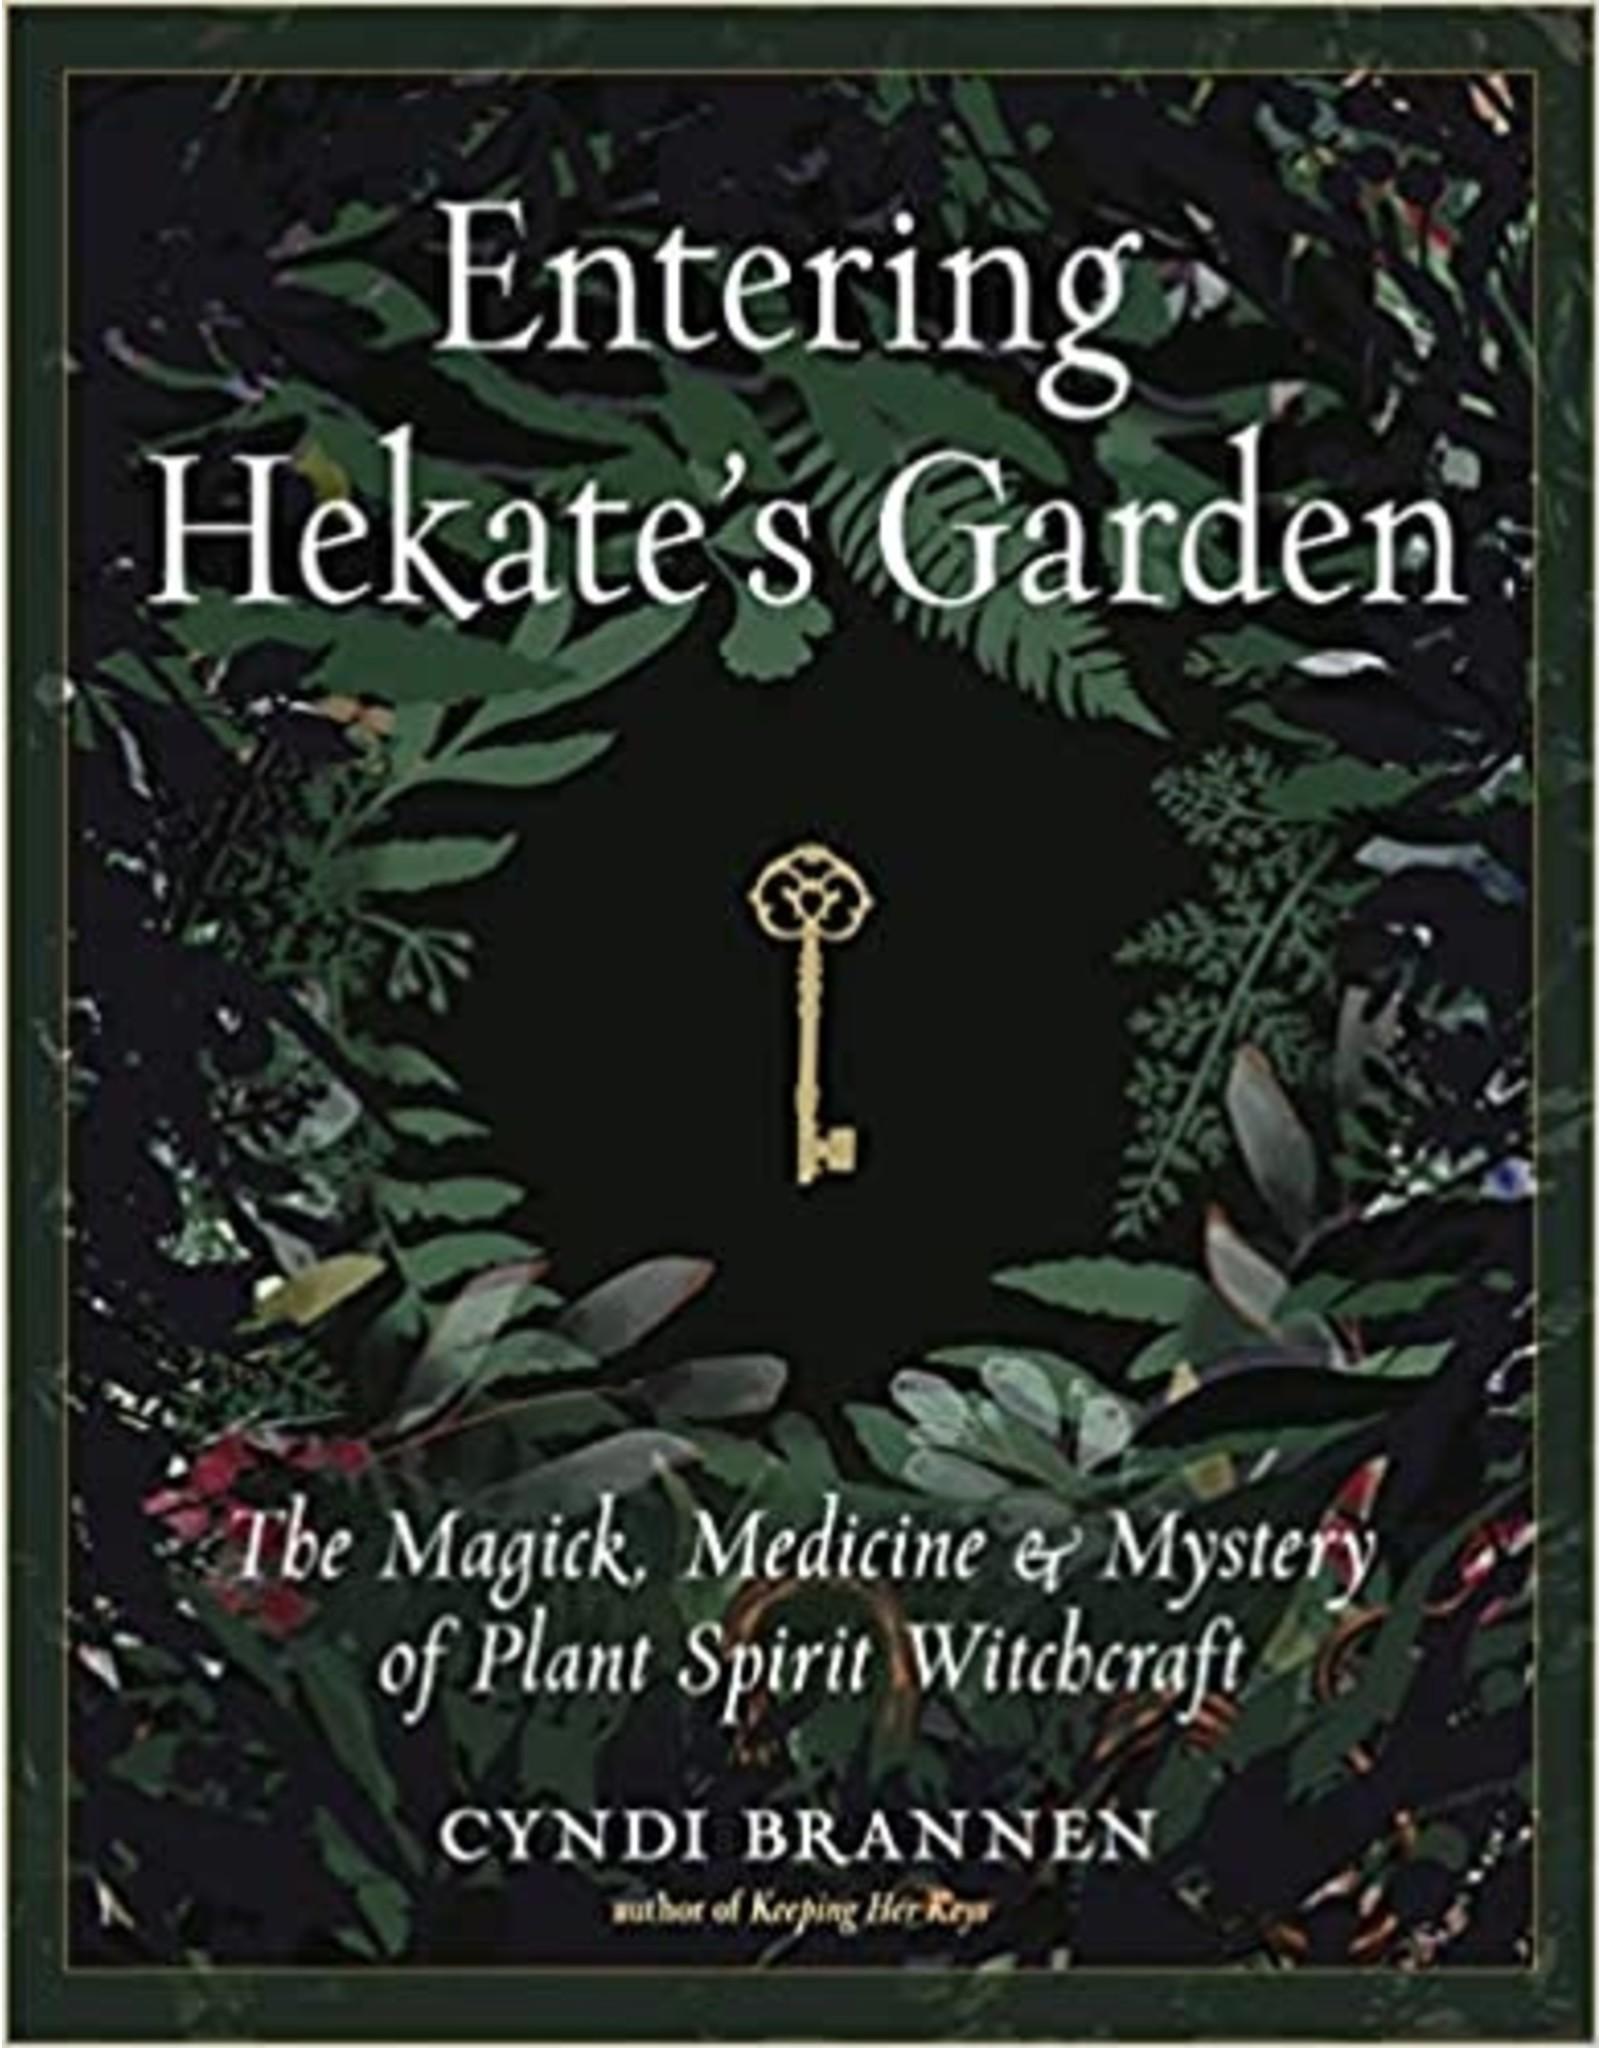 Entering Hekate's Garden